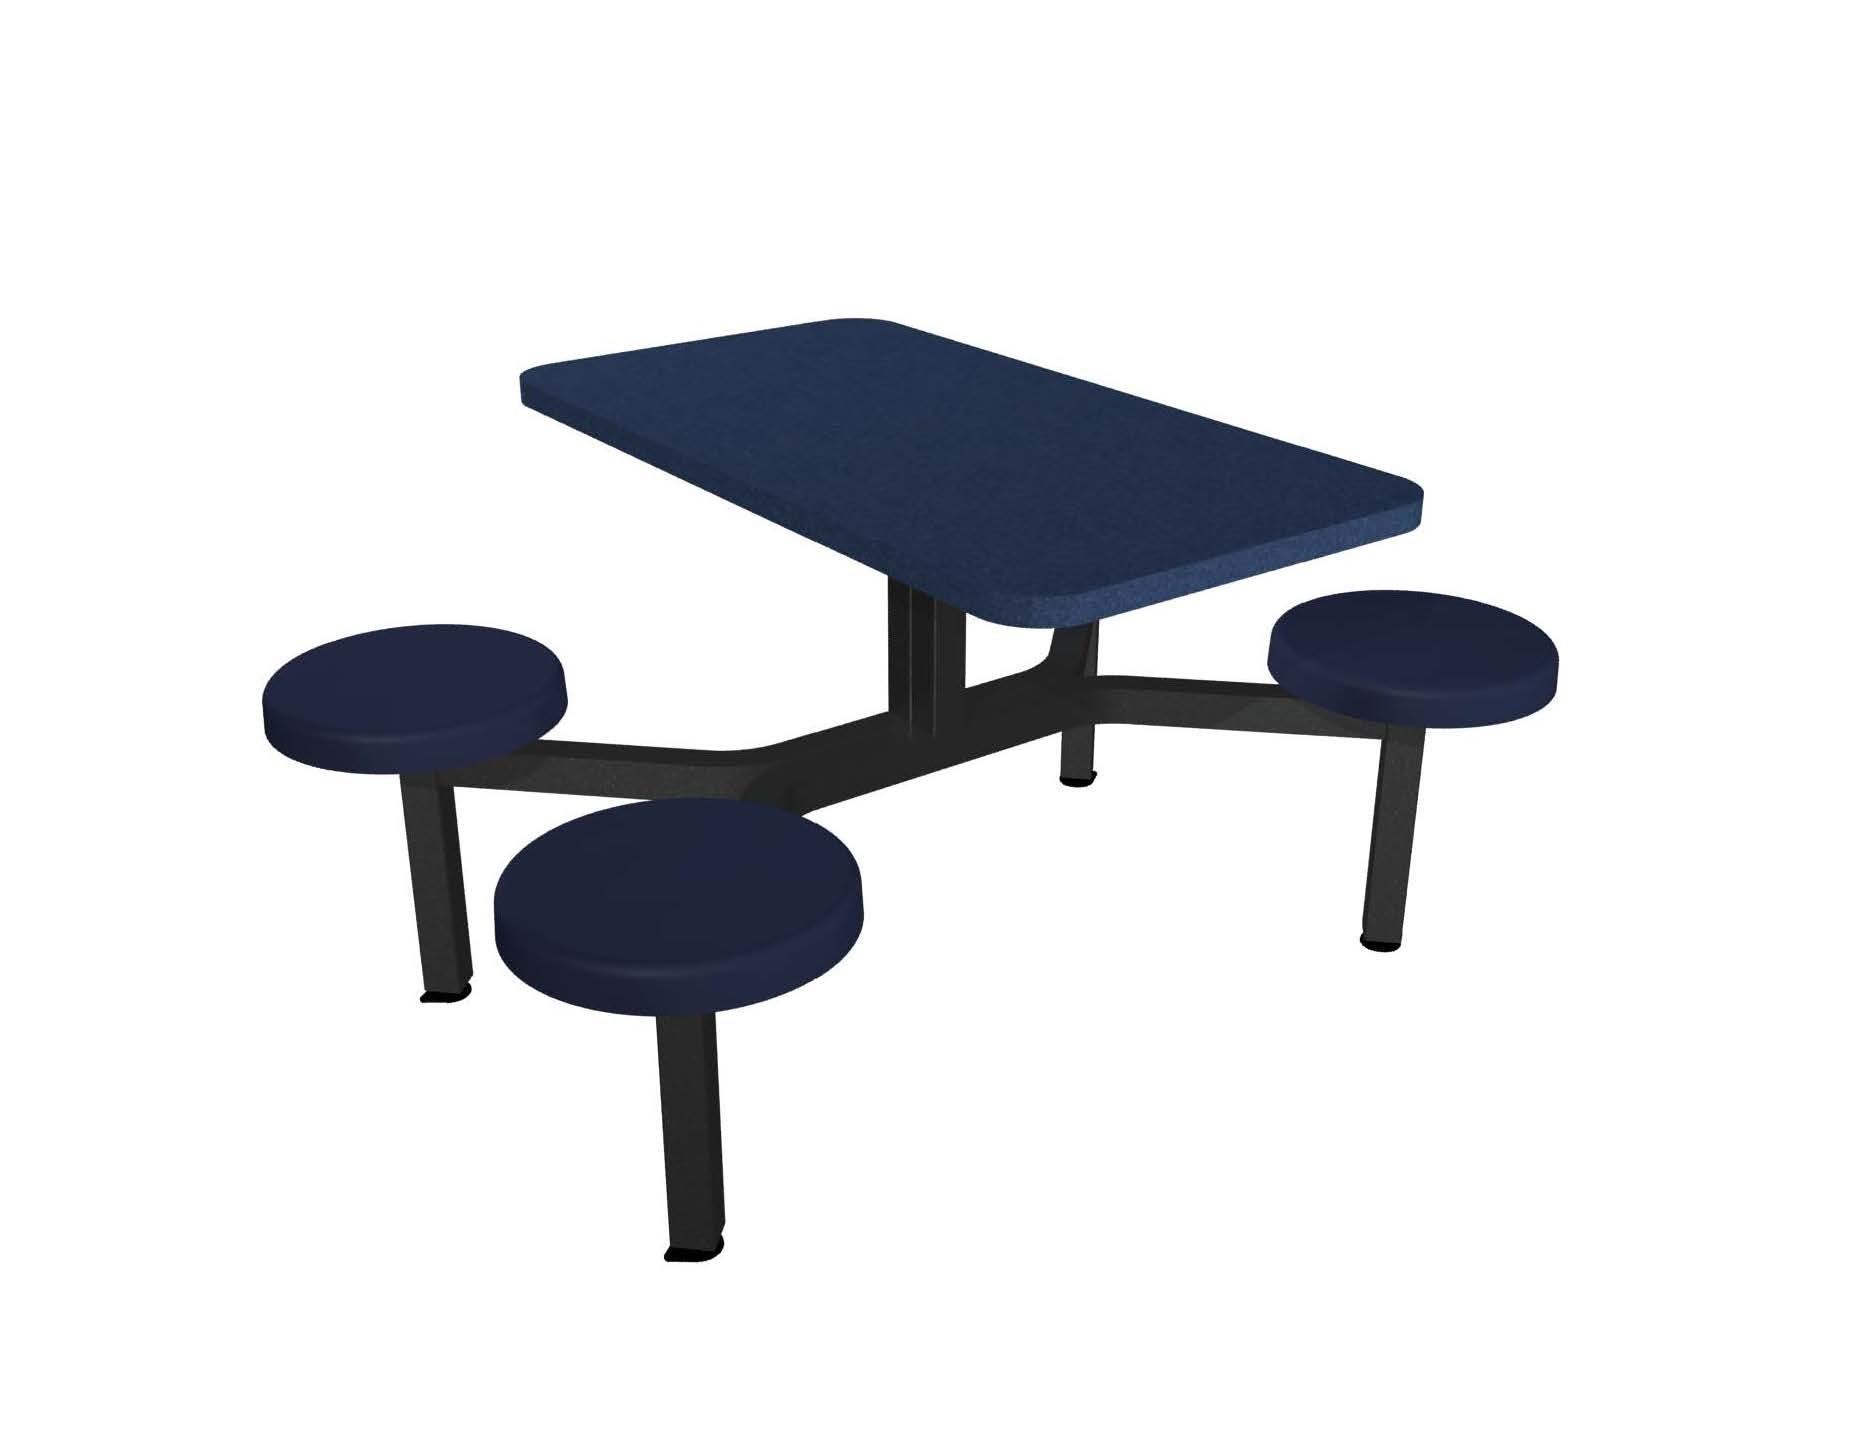 Cebra 4 Seat Island Unit Composite Button Seats Millennium Seating Usa Restaurant